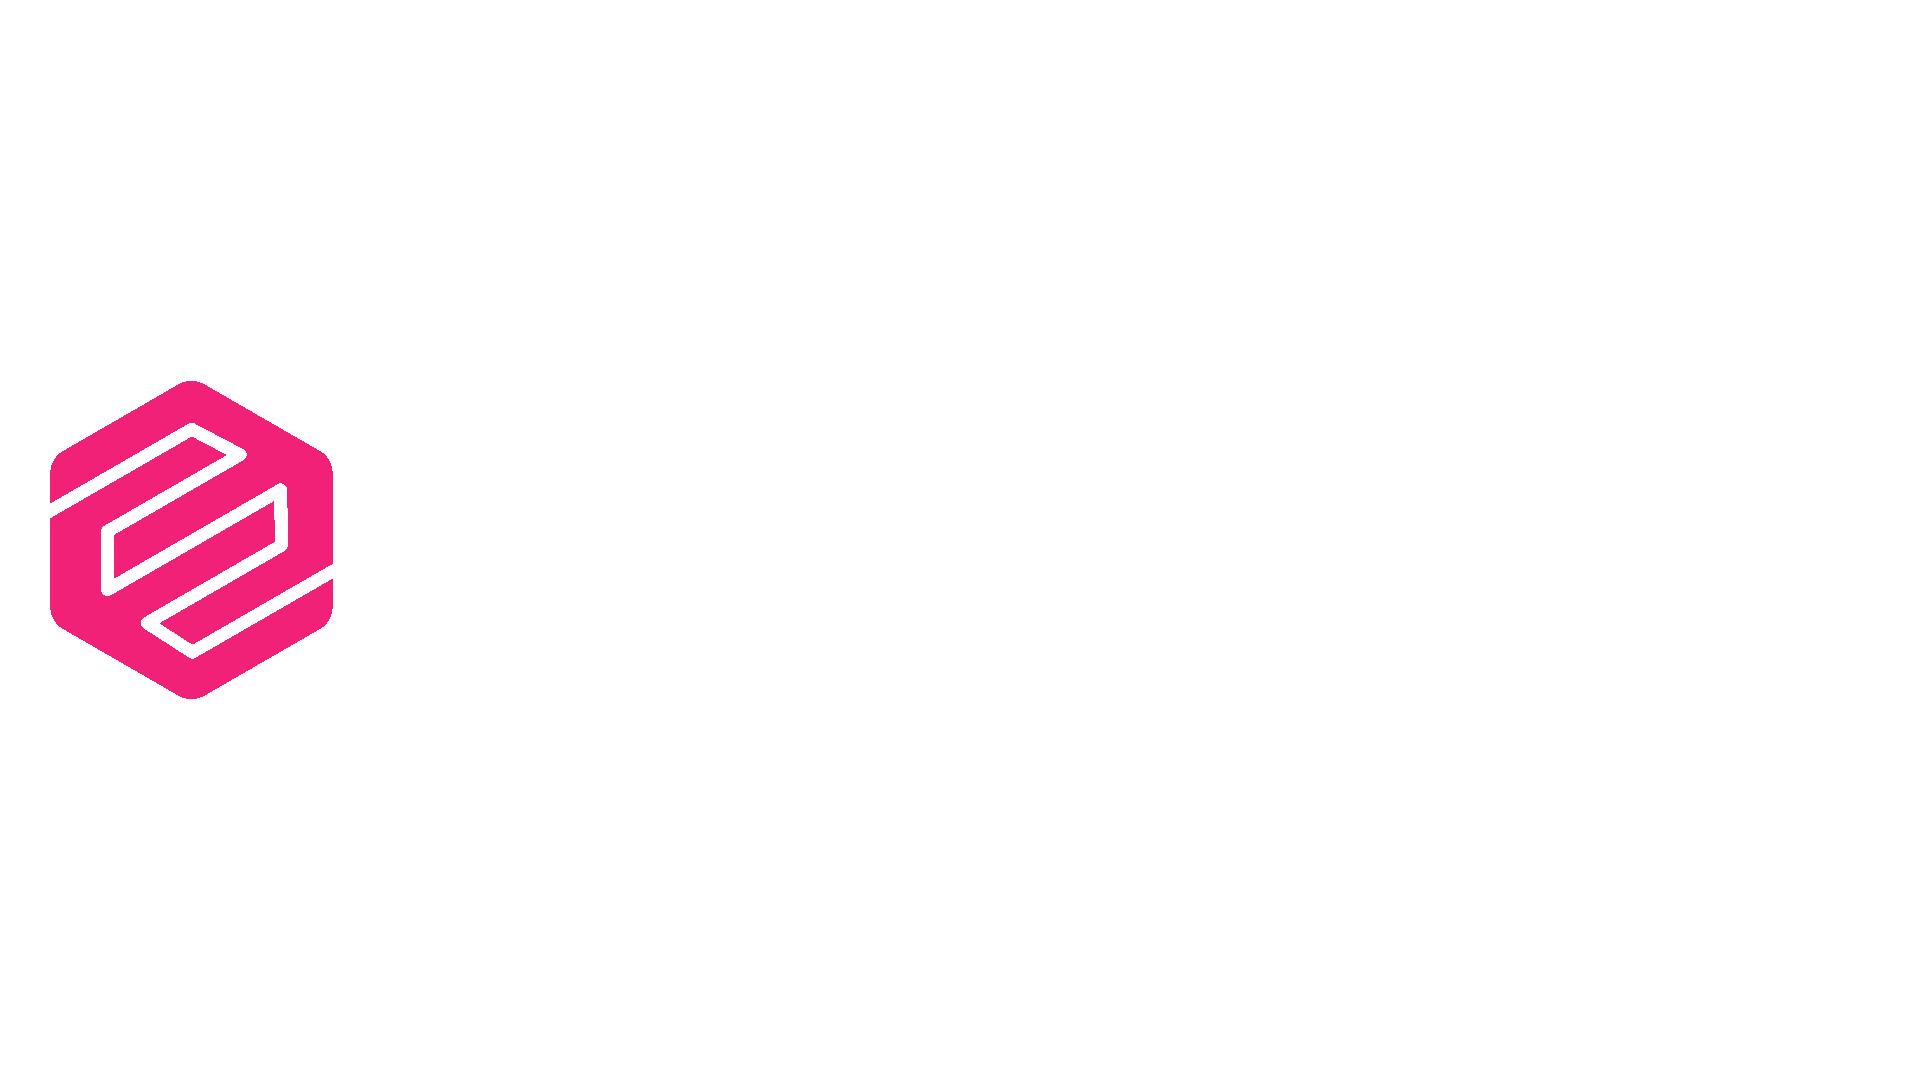 thirdera logo icon_2021-04 _pink_1